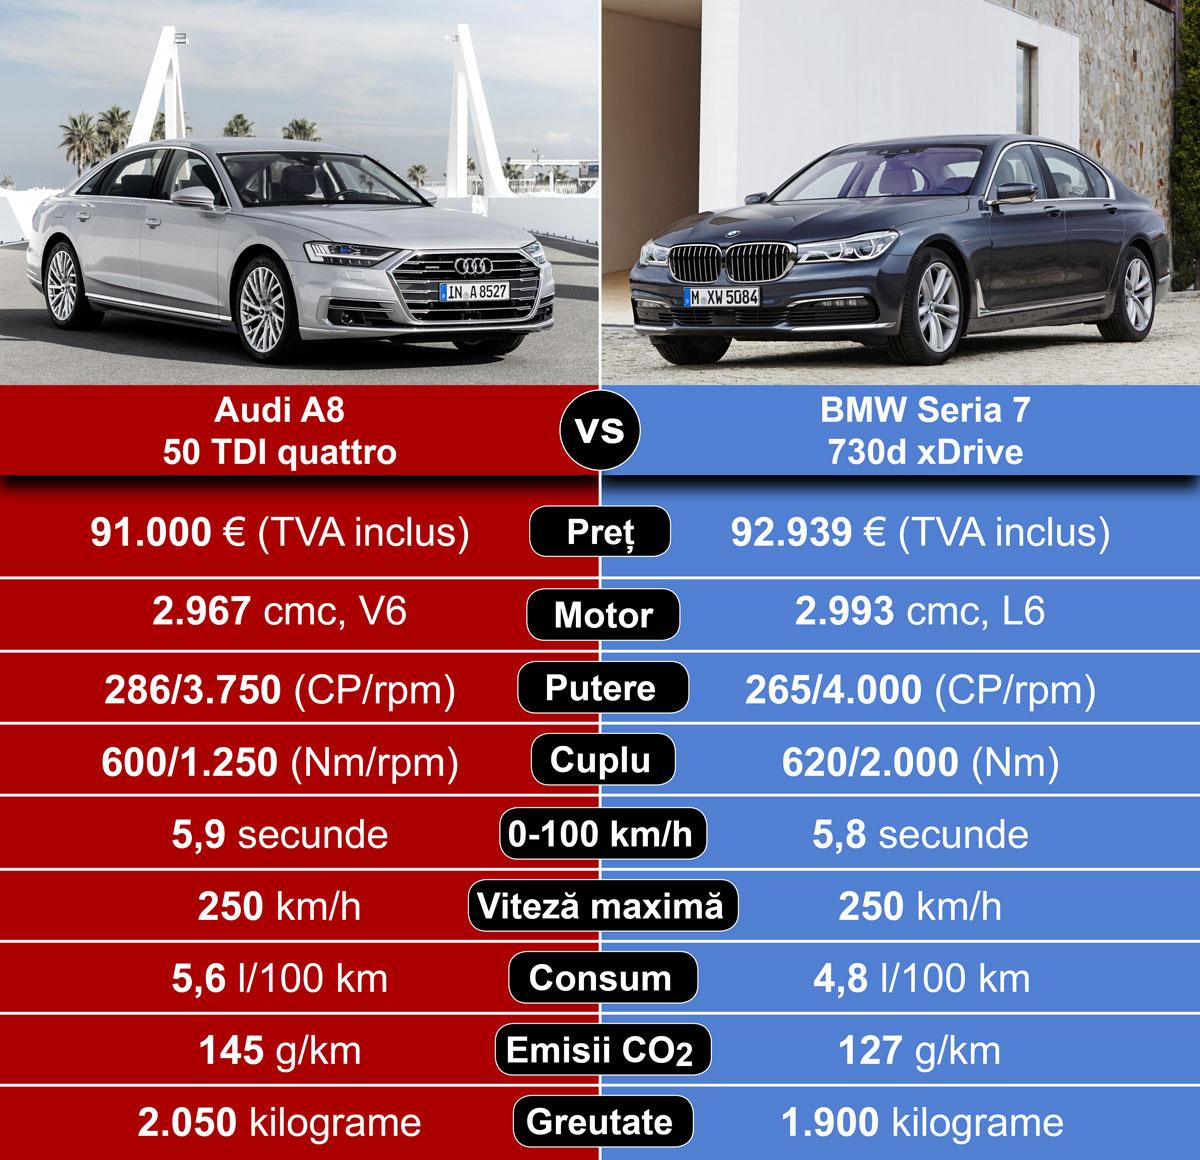 Bmw Xdrive Vs Audi Quattro: Noul Audi A8 Vs BMW Seria 7: Motorizări Diesel